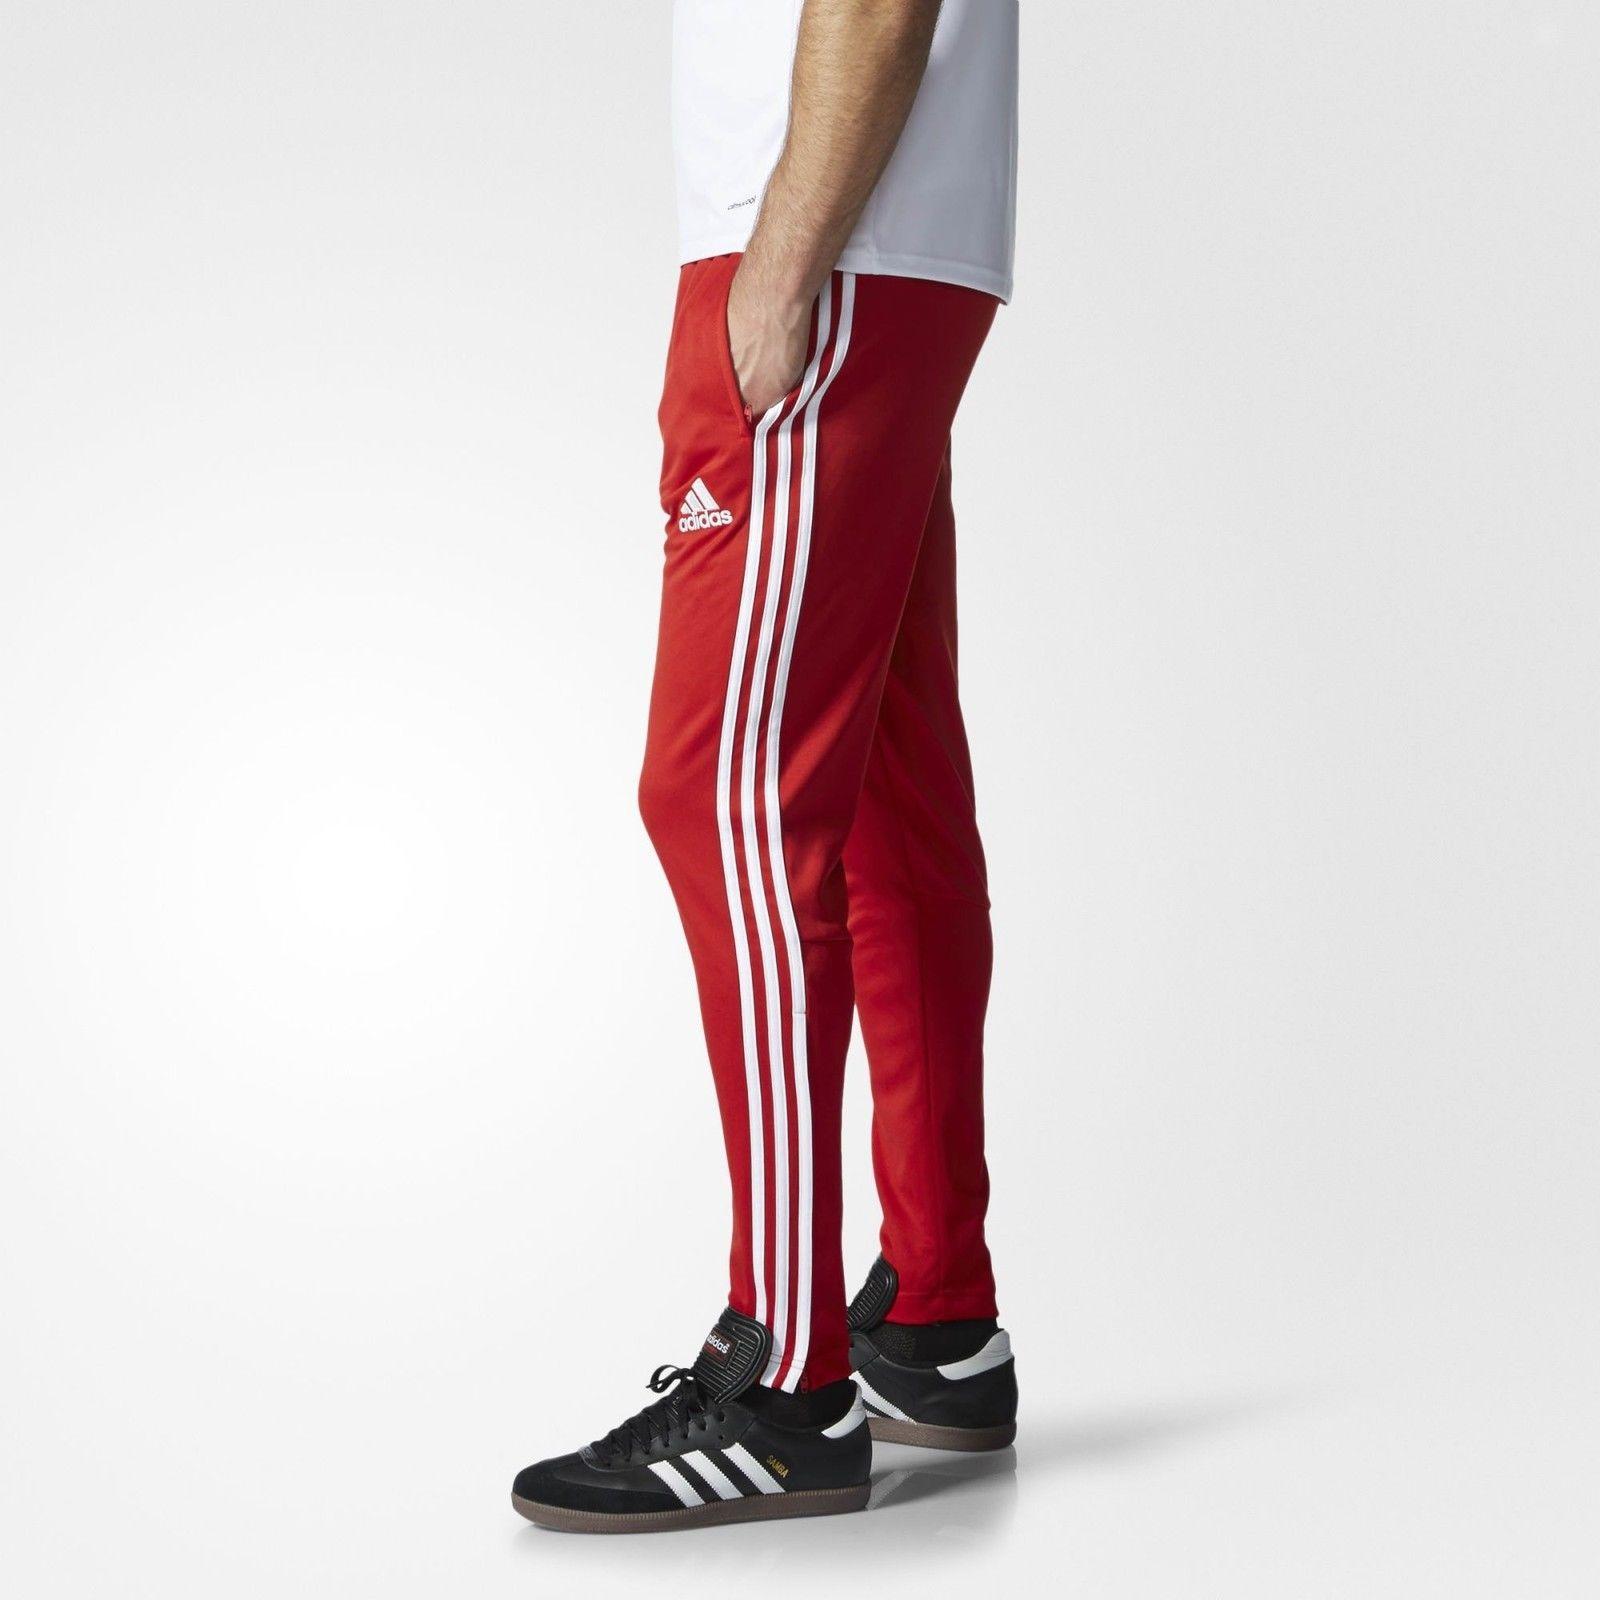 adidas red tracksuit bottoms, Men's sweatshirt adidas tiro15